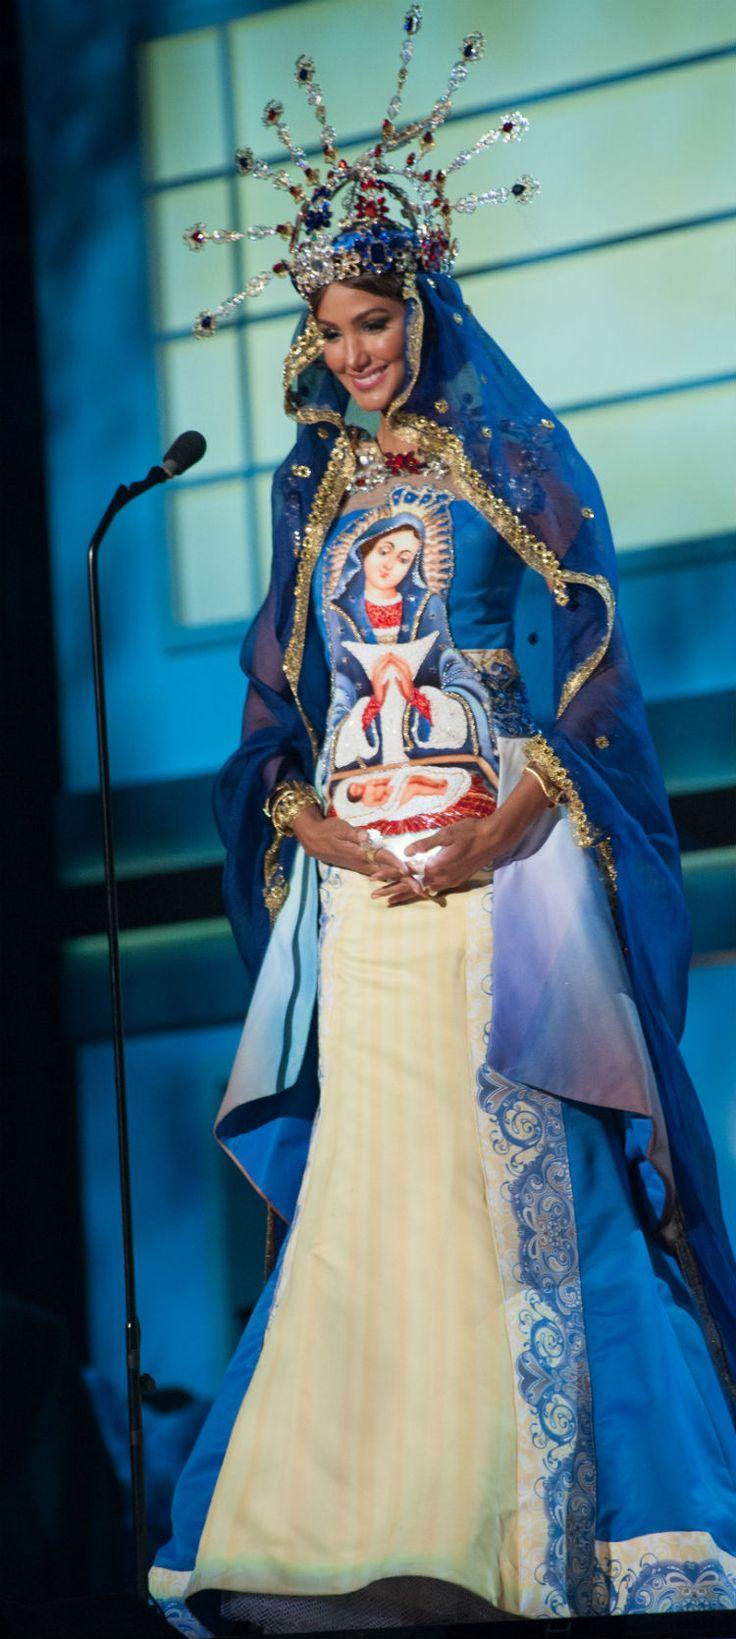 miss-dominican-republic-kimberly-castillo-costume-miss-universe-2015.jpg